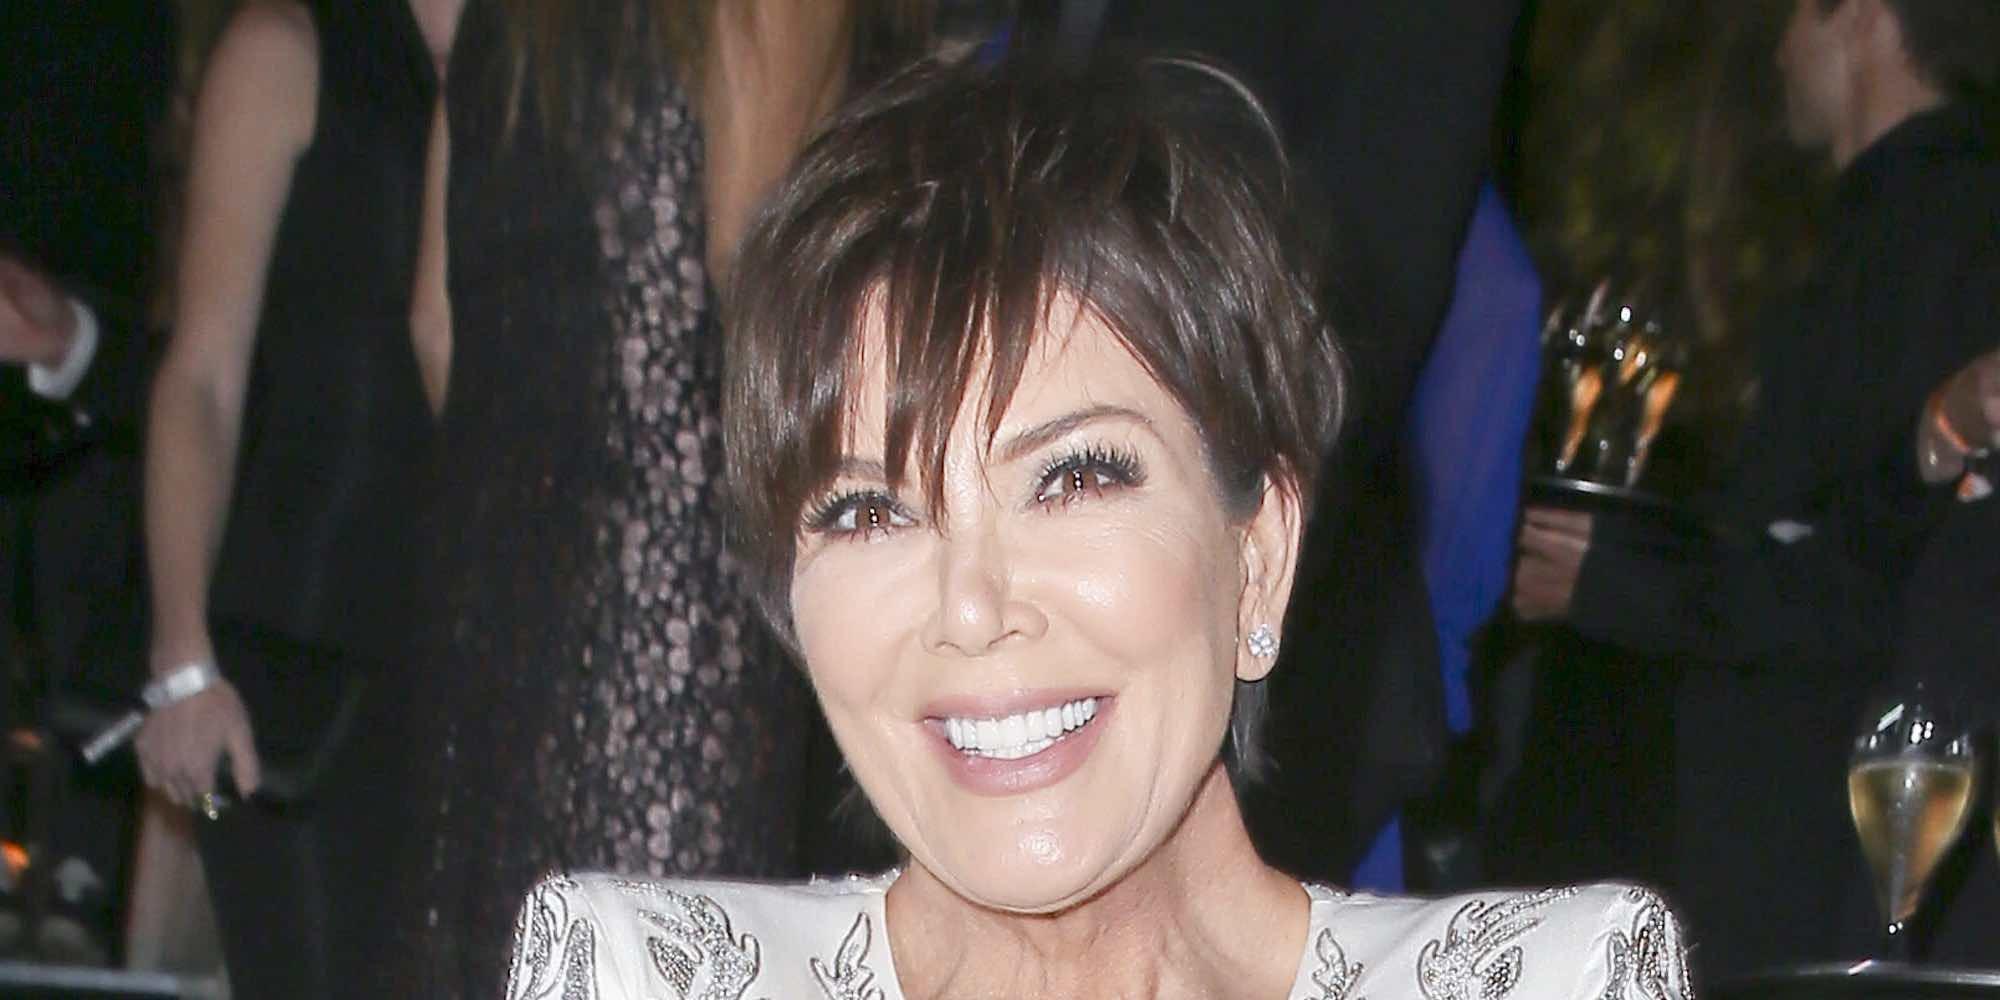 Kris Jenner explica el significado del nombre de la primera hija de Khloe Kardashian